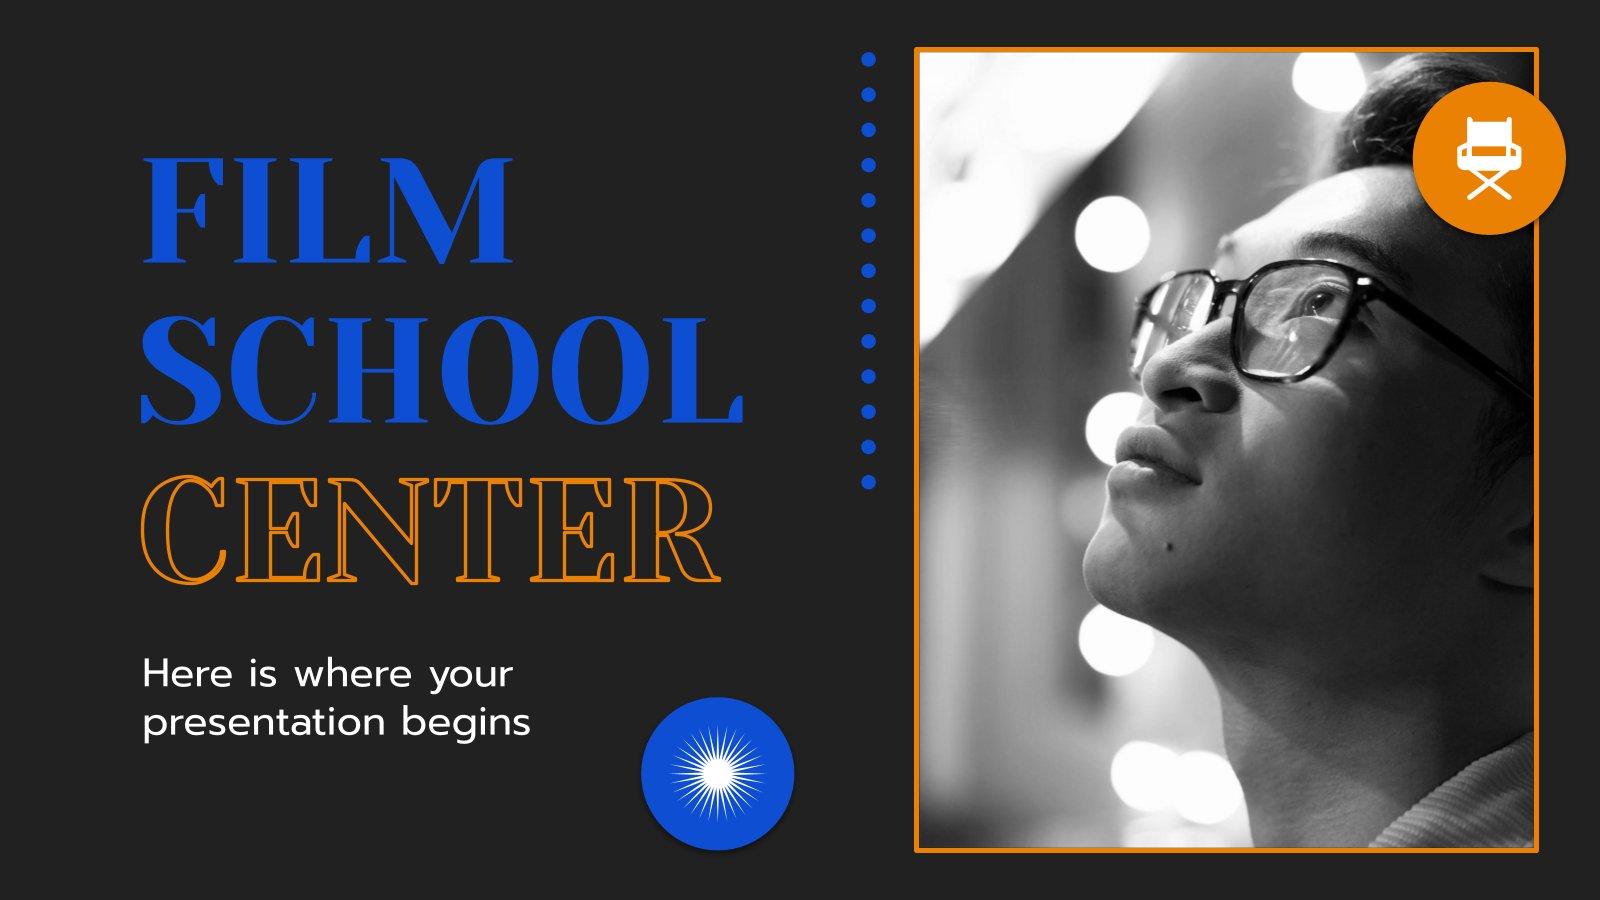 Film School Center presentation template